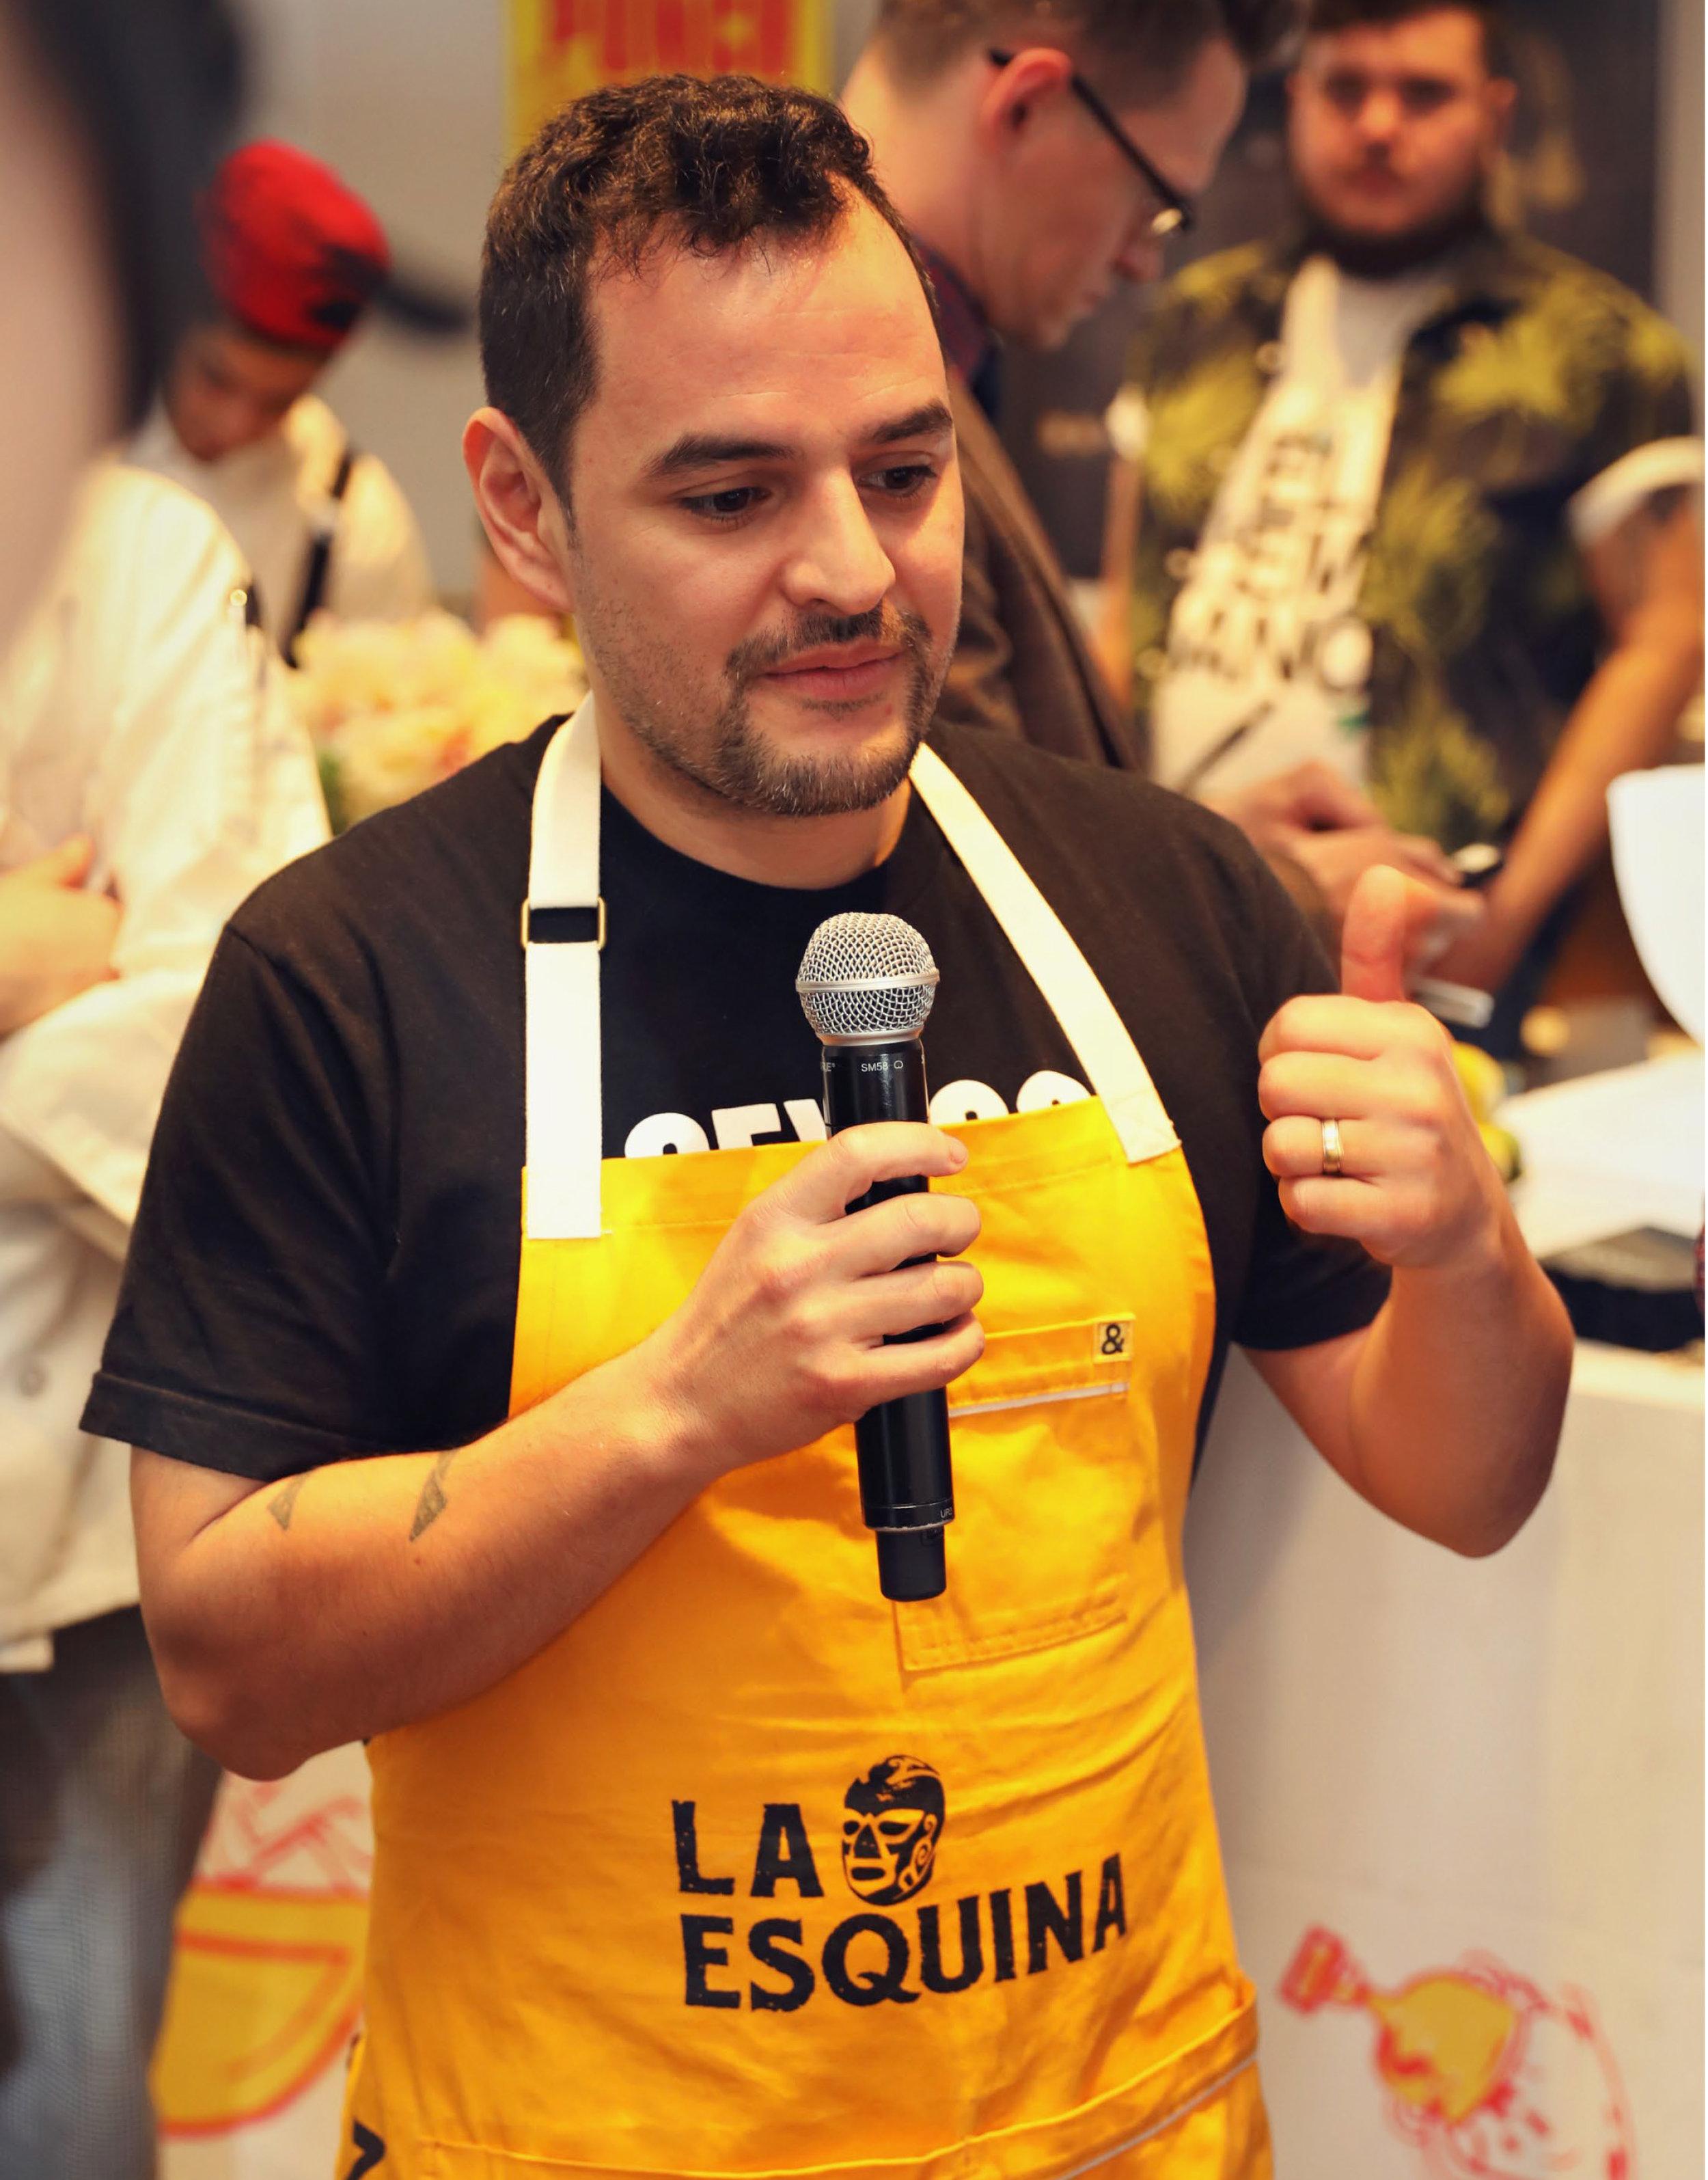 Chef Fabian Gallardo of La Esquina